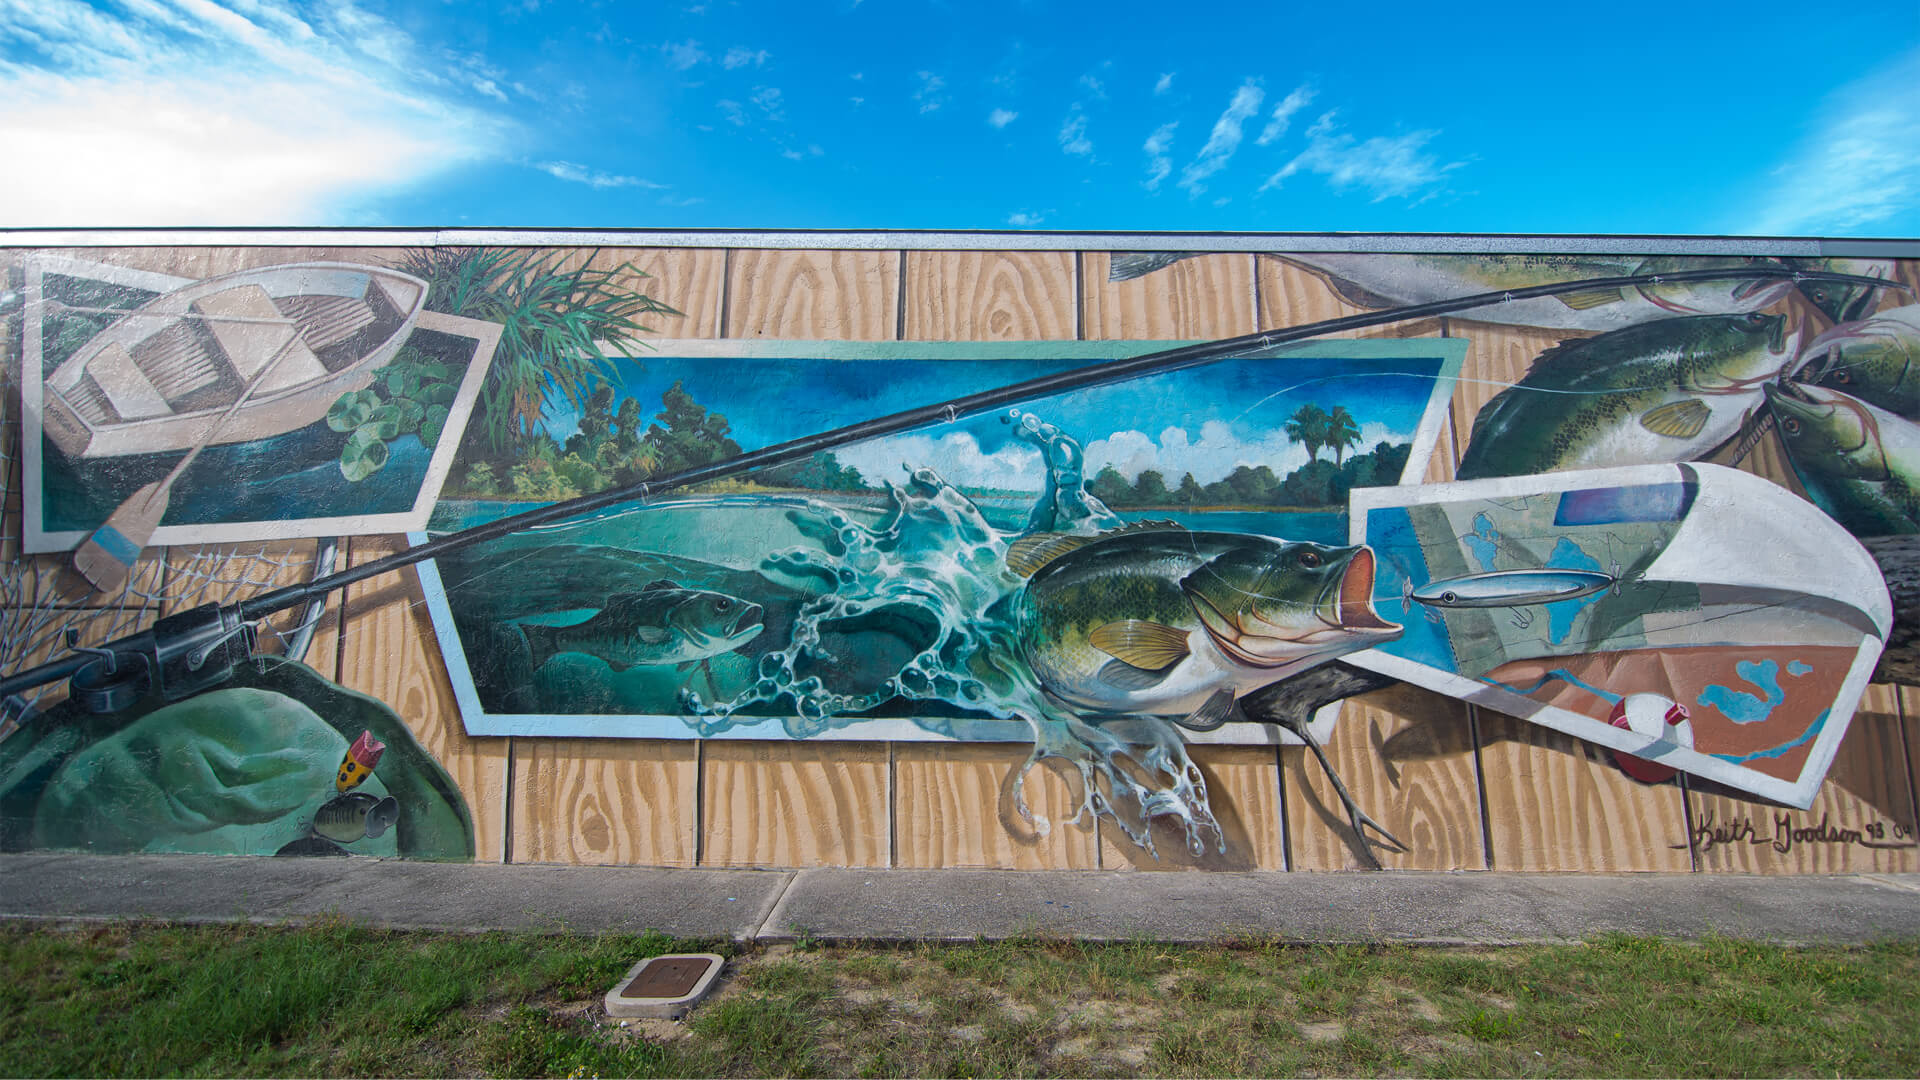 Lake Placid | Visit Sebring Florida